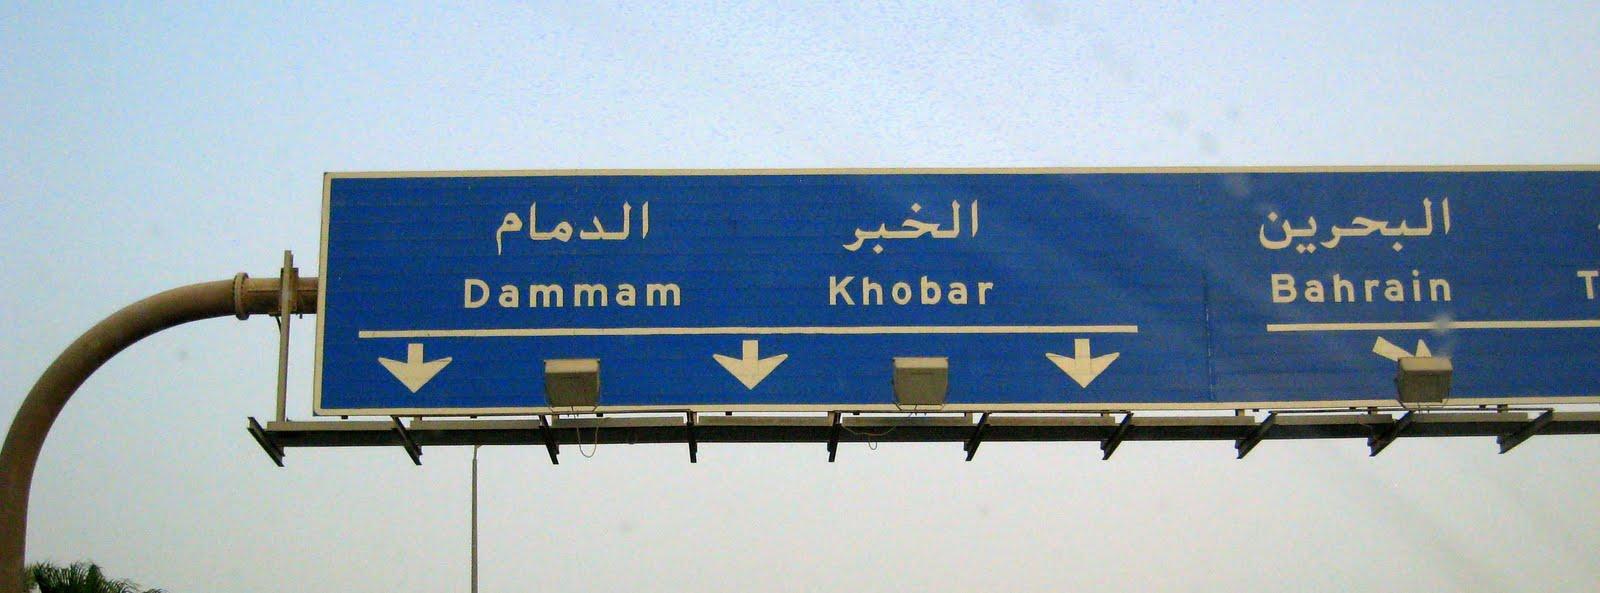 Dammam, KSA border and Bahrain border